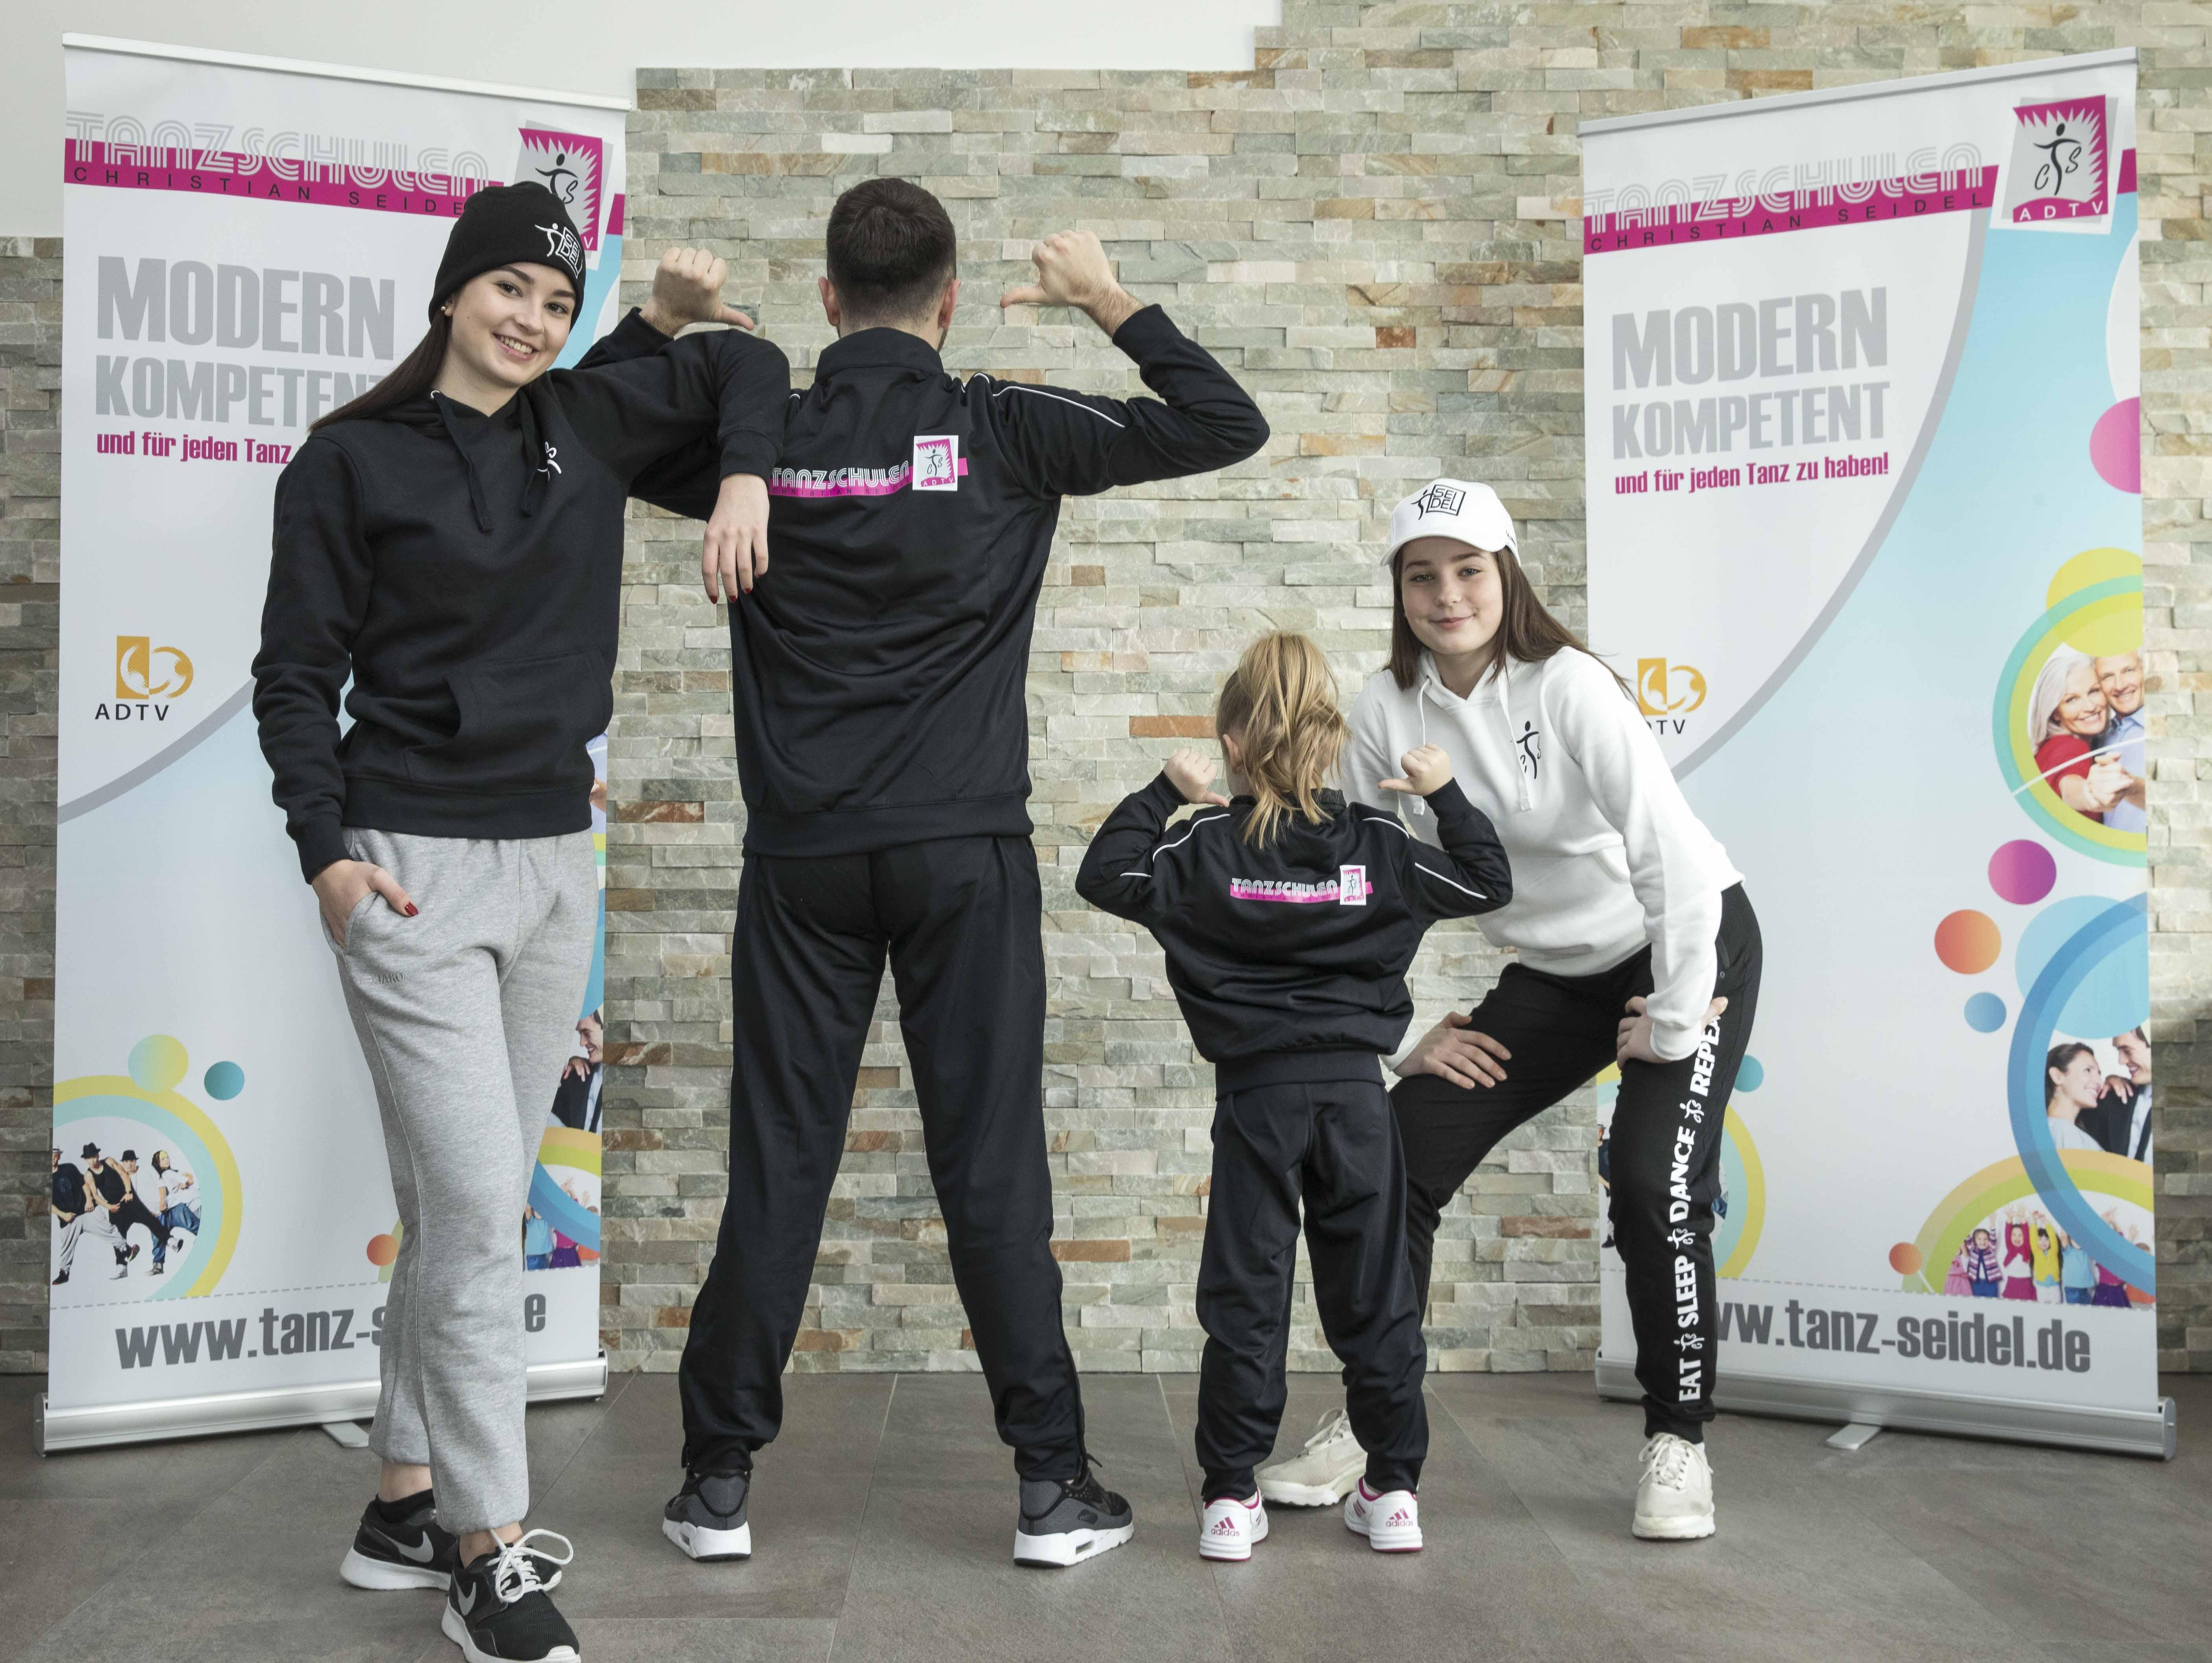 ADTV Tanzschule C. Seidel   jako.de